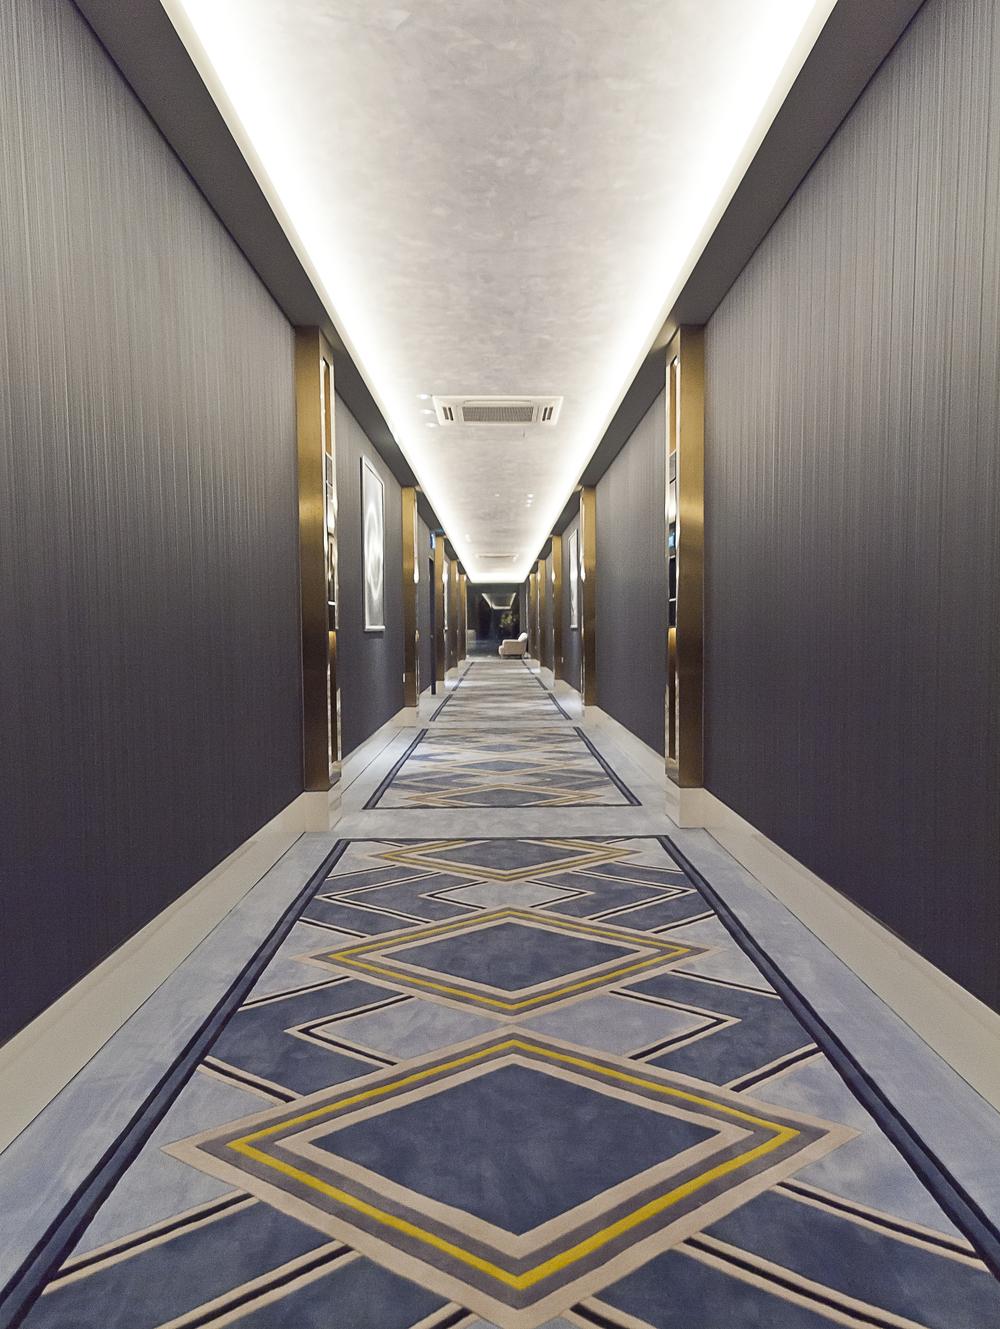 Ottocento stucco italian design center pte ltd special for A t design decoration co ltd